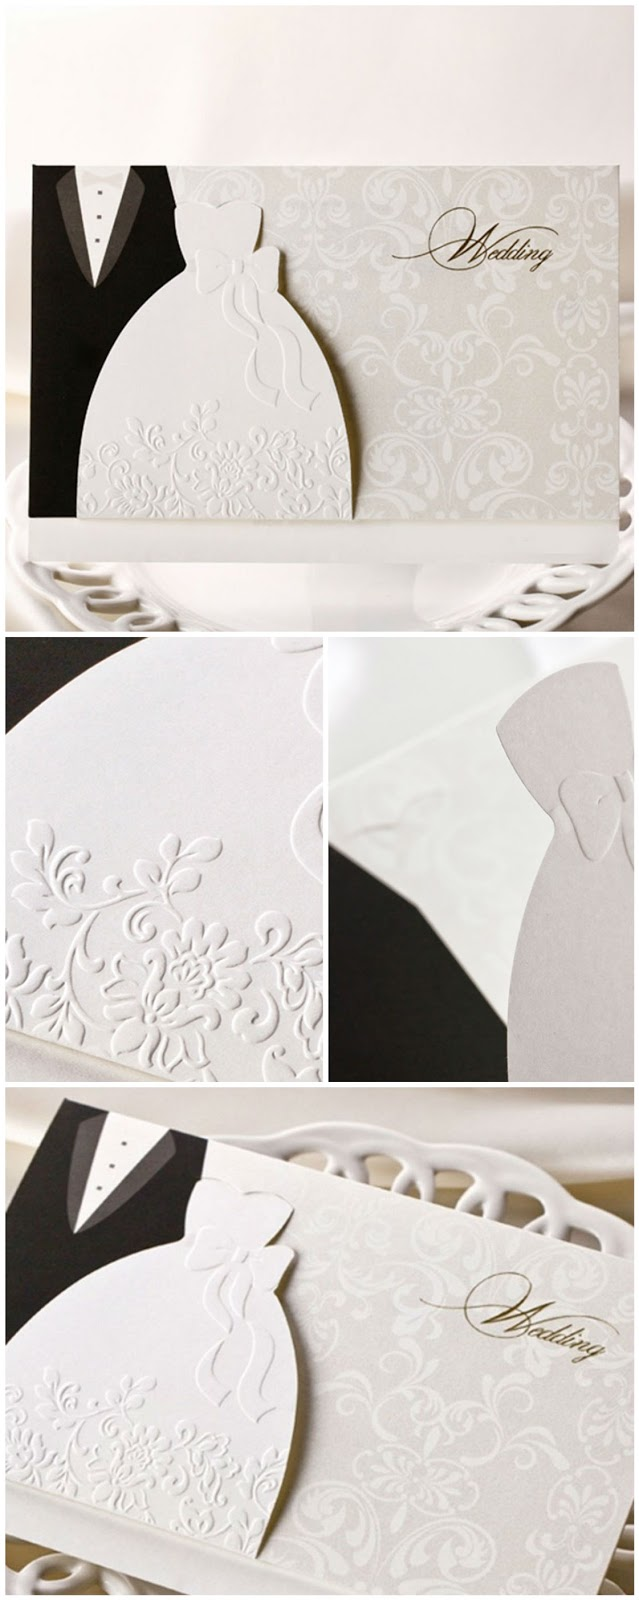 Embossed Western Style Pocket Wedding Card